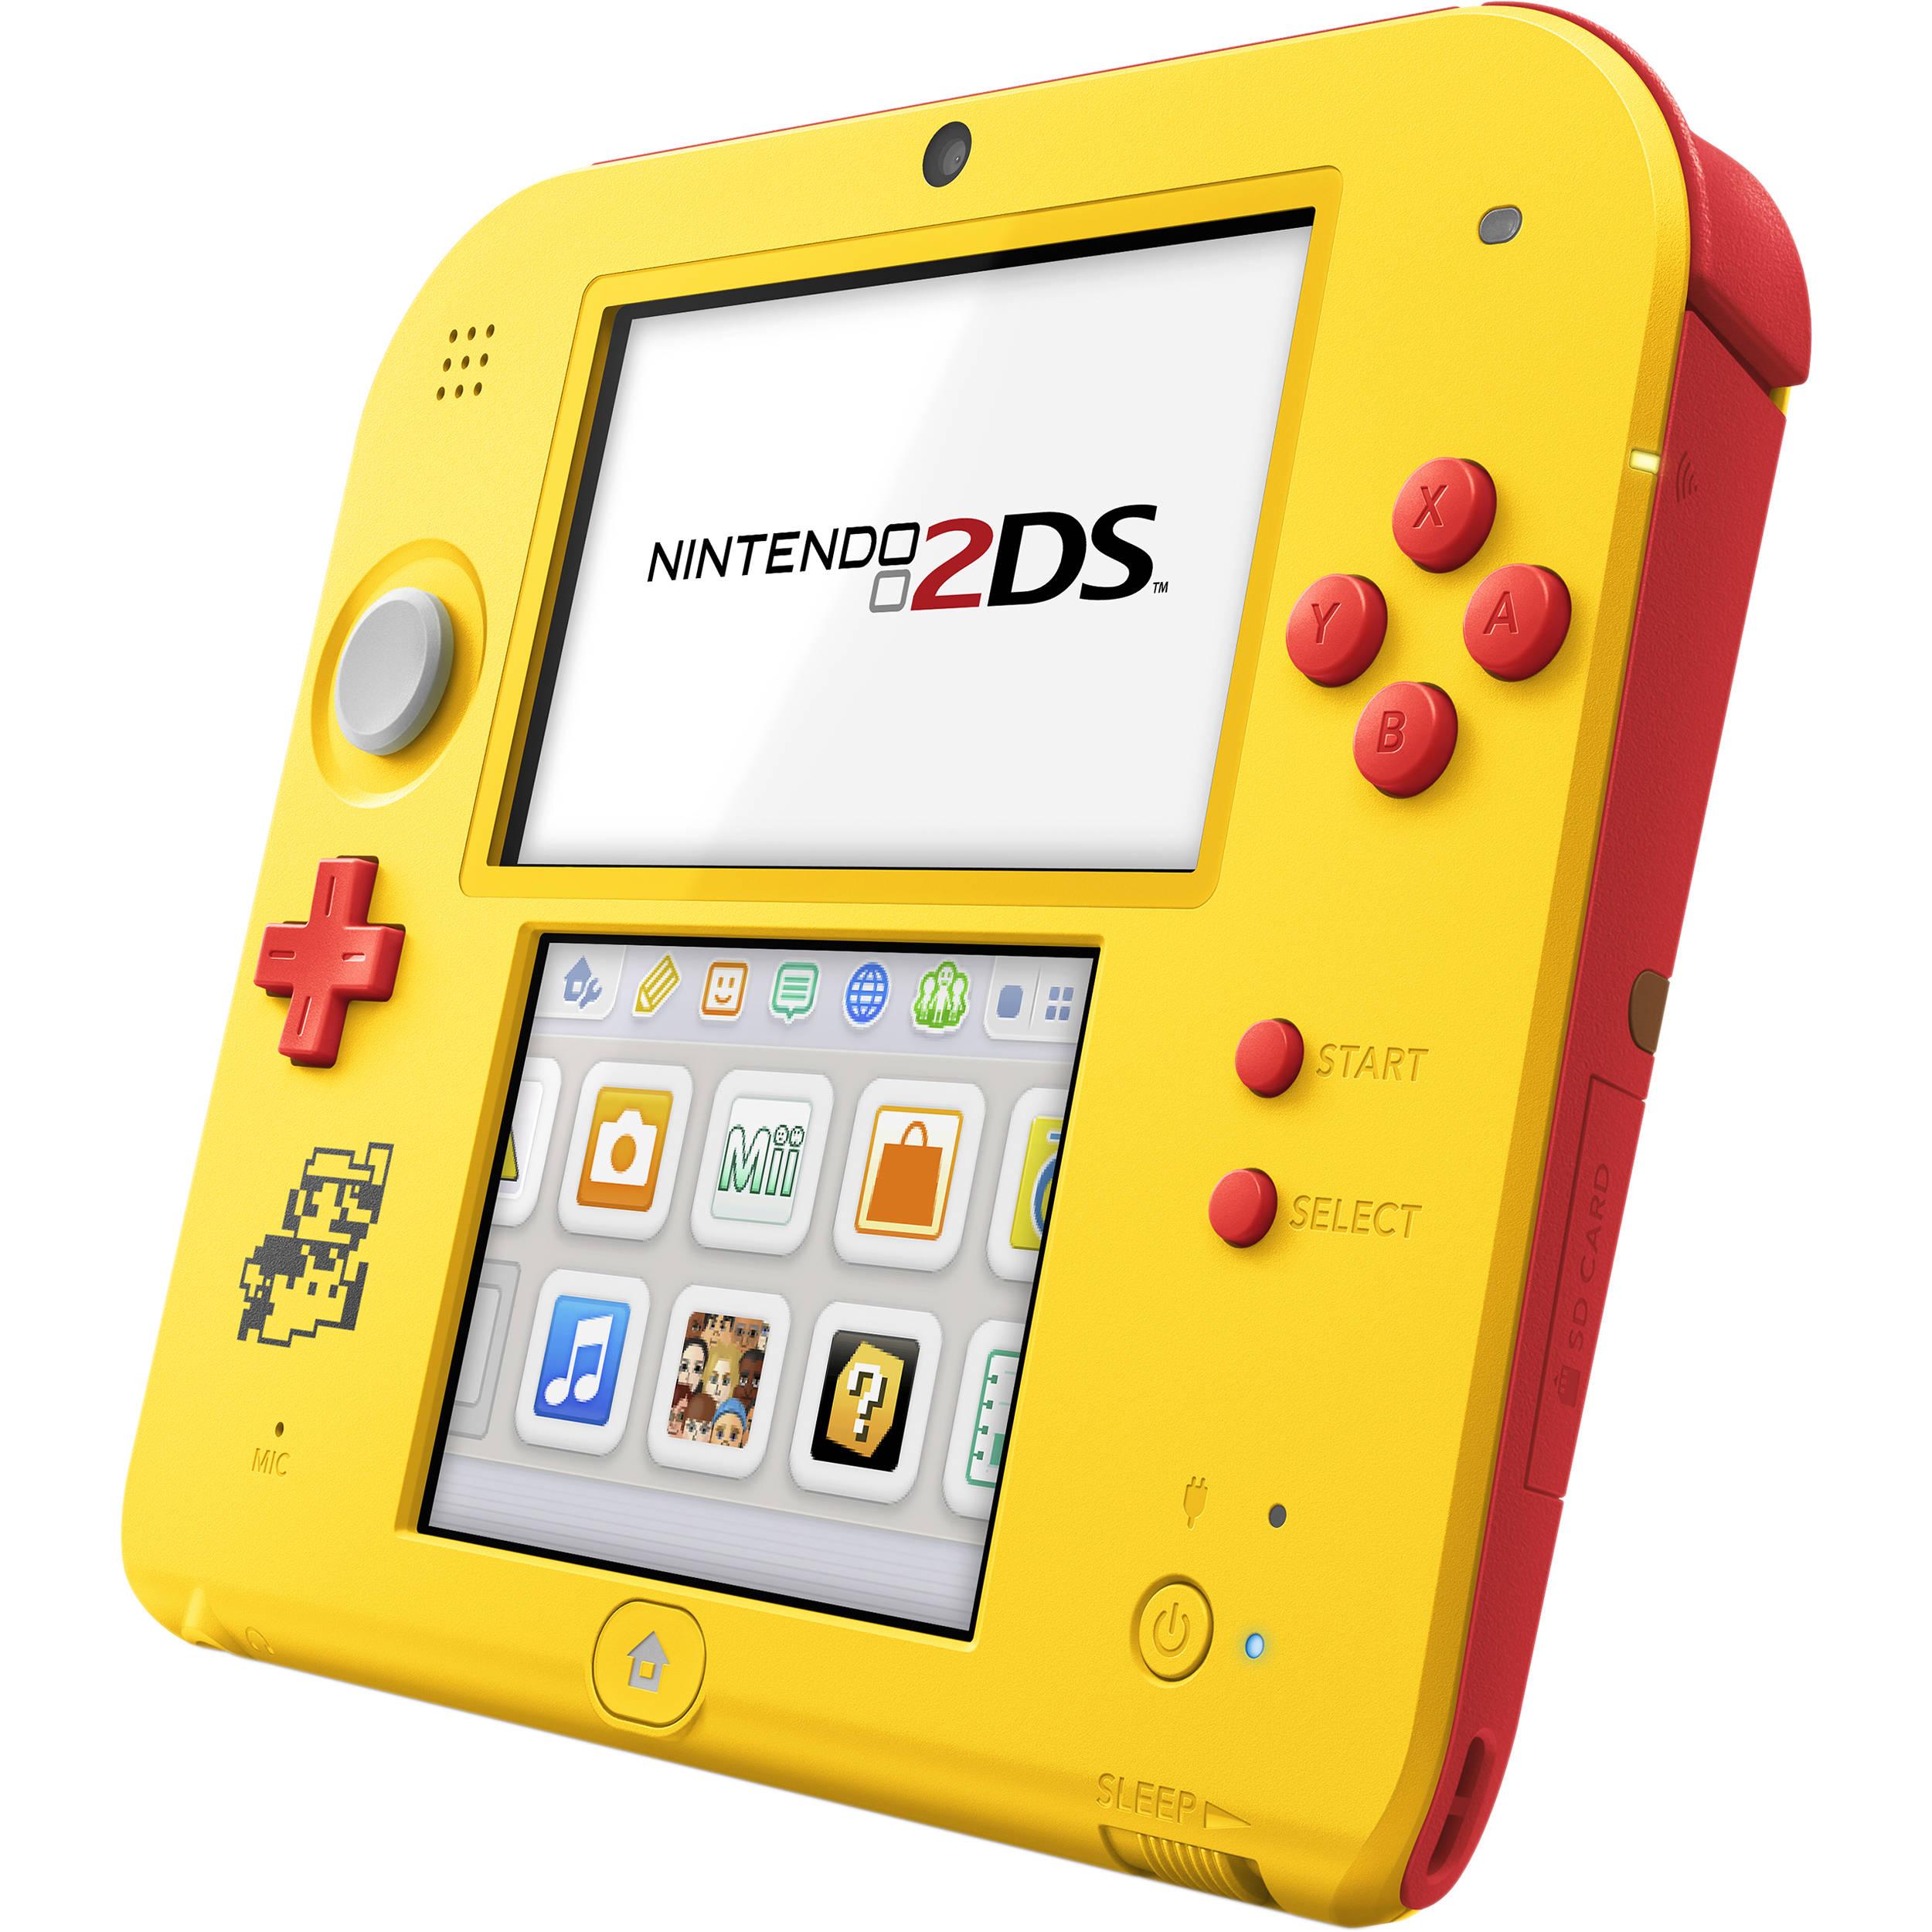 Nintendo 2DS - Nintendo 3DS Wiki Guide - IGN